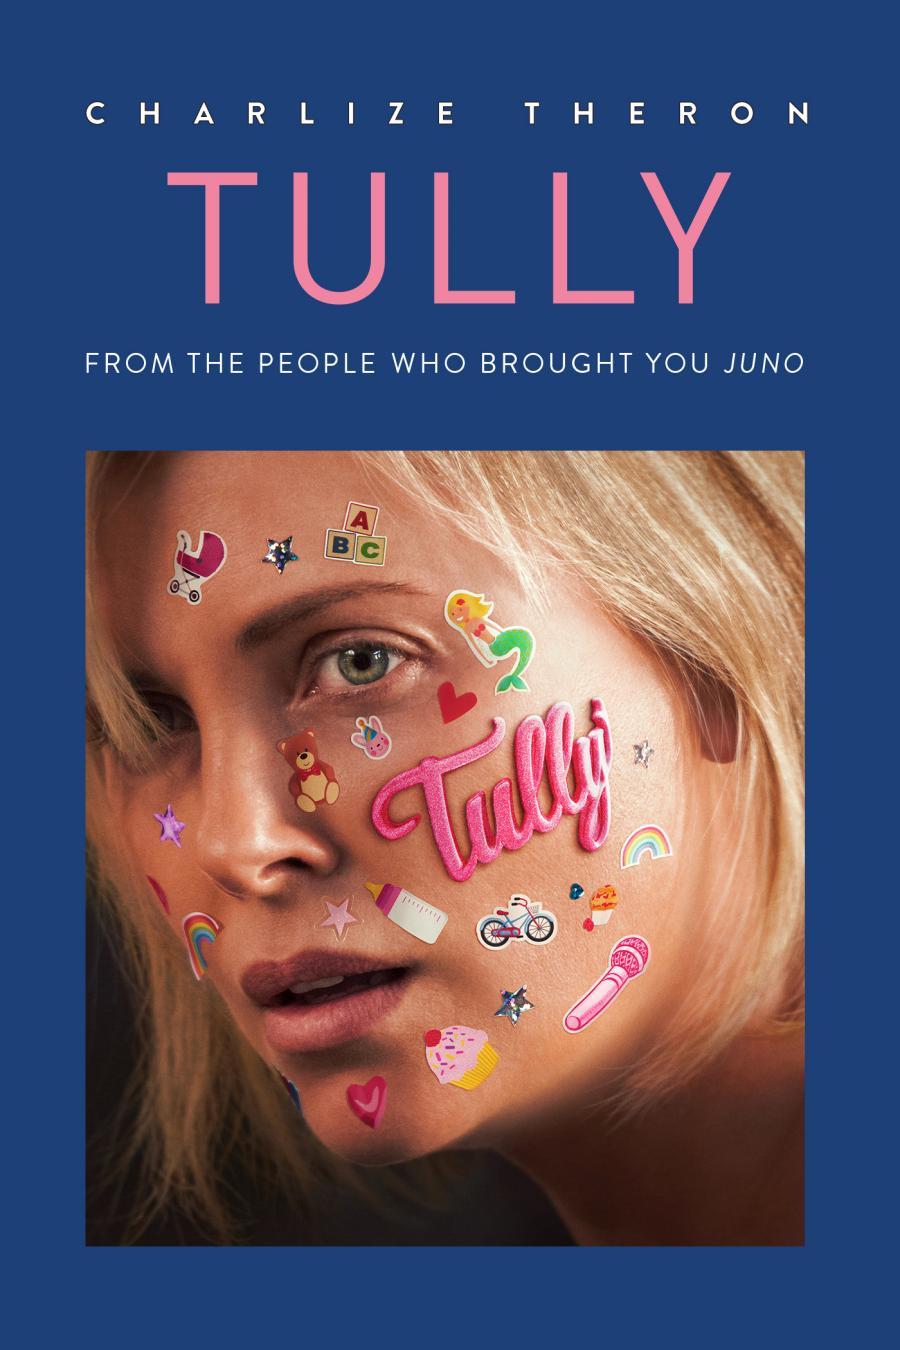 Fra filmen Tully der kan streames via Filmstriben